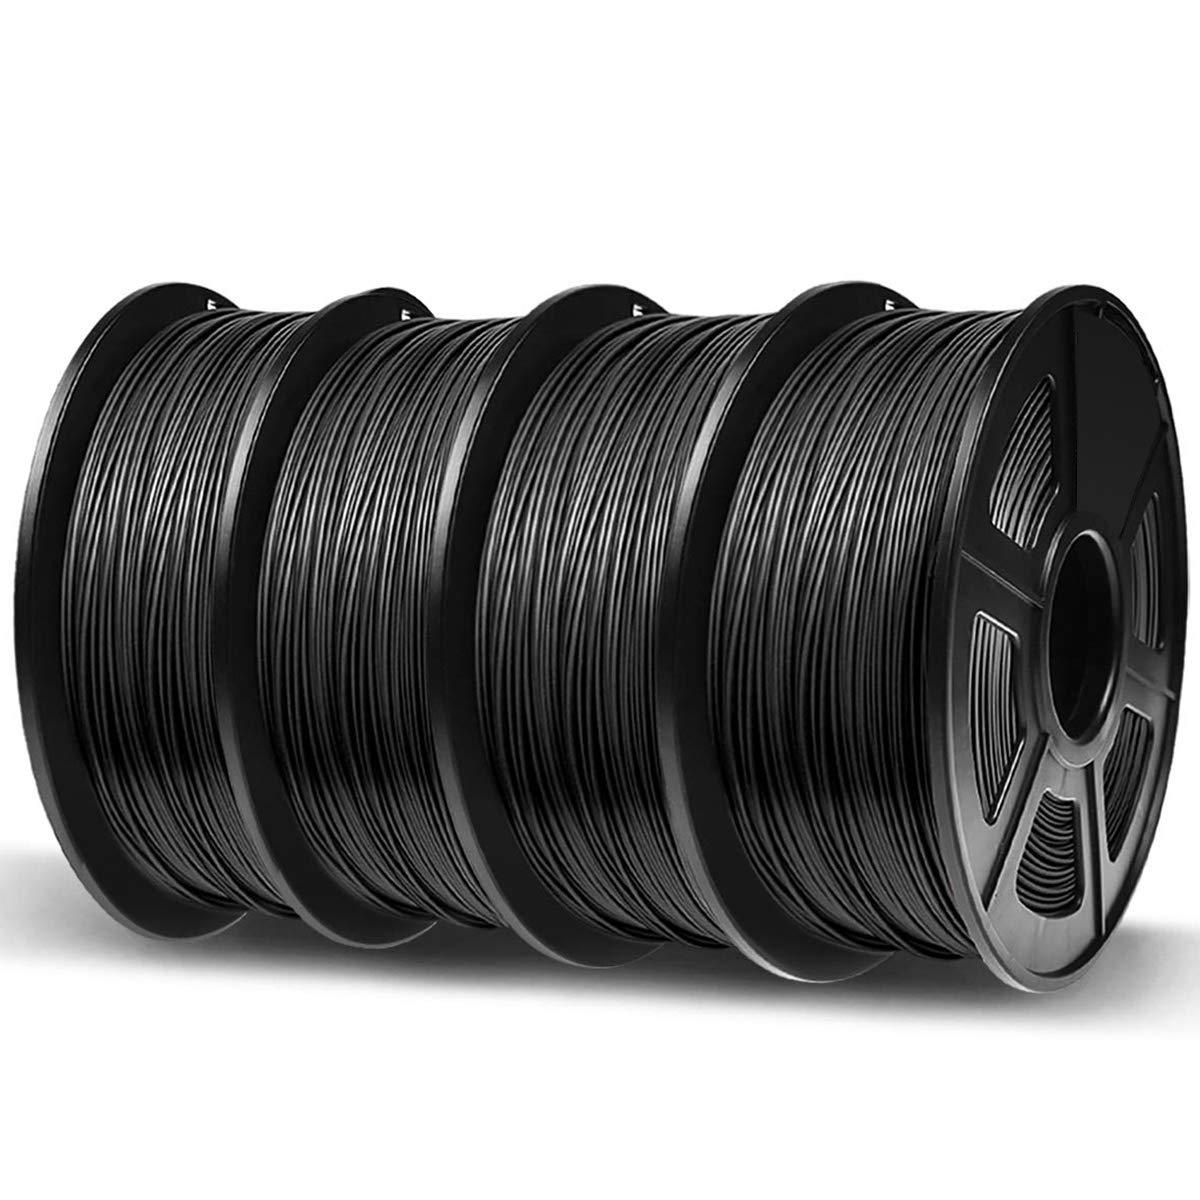 Dimensional Accuracy +//- 0.02 mm 1KG PLA Filament Black Bonus with 5M PCL Nozzle Cleaning Filament 3D Hero PLA Filament 1.75mm,PLA 3D Printer Filament 2.2 LBS ,1.75mm Filament